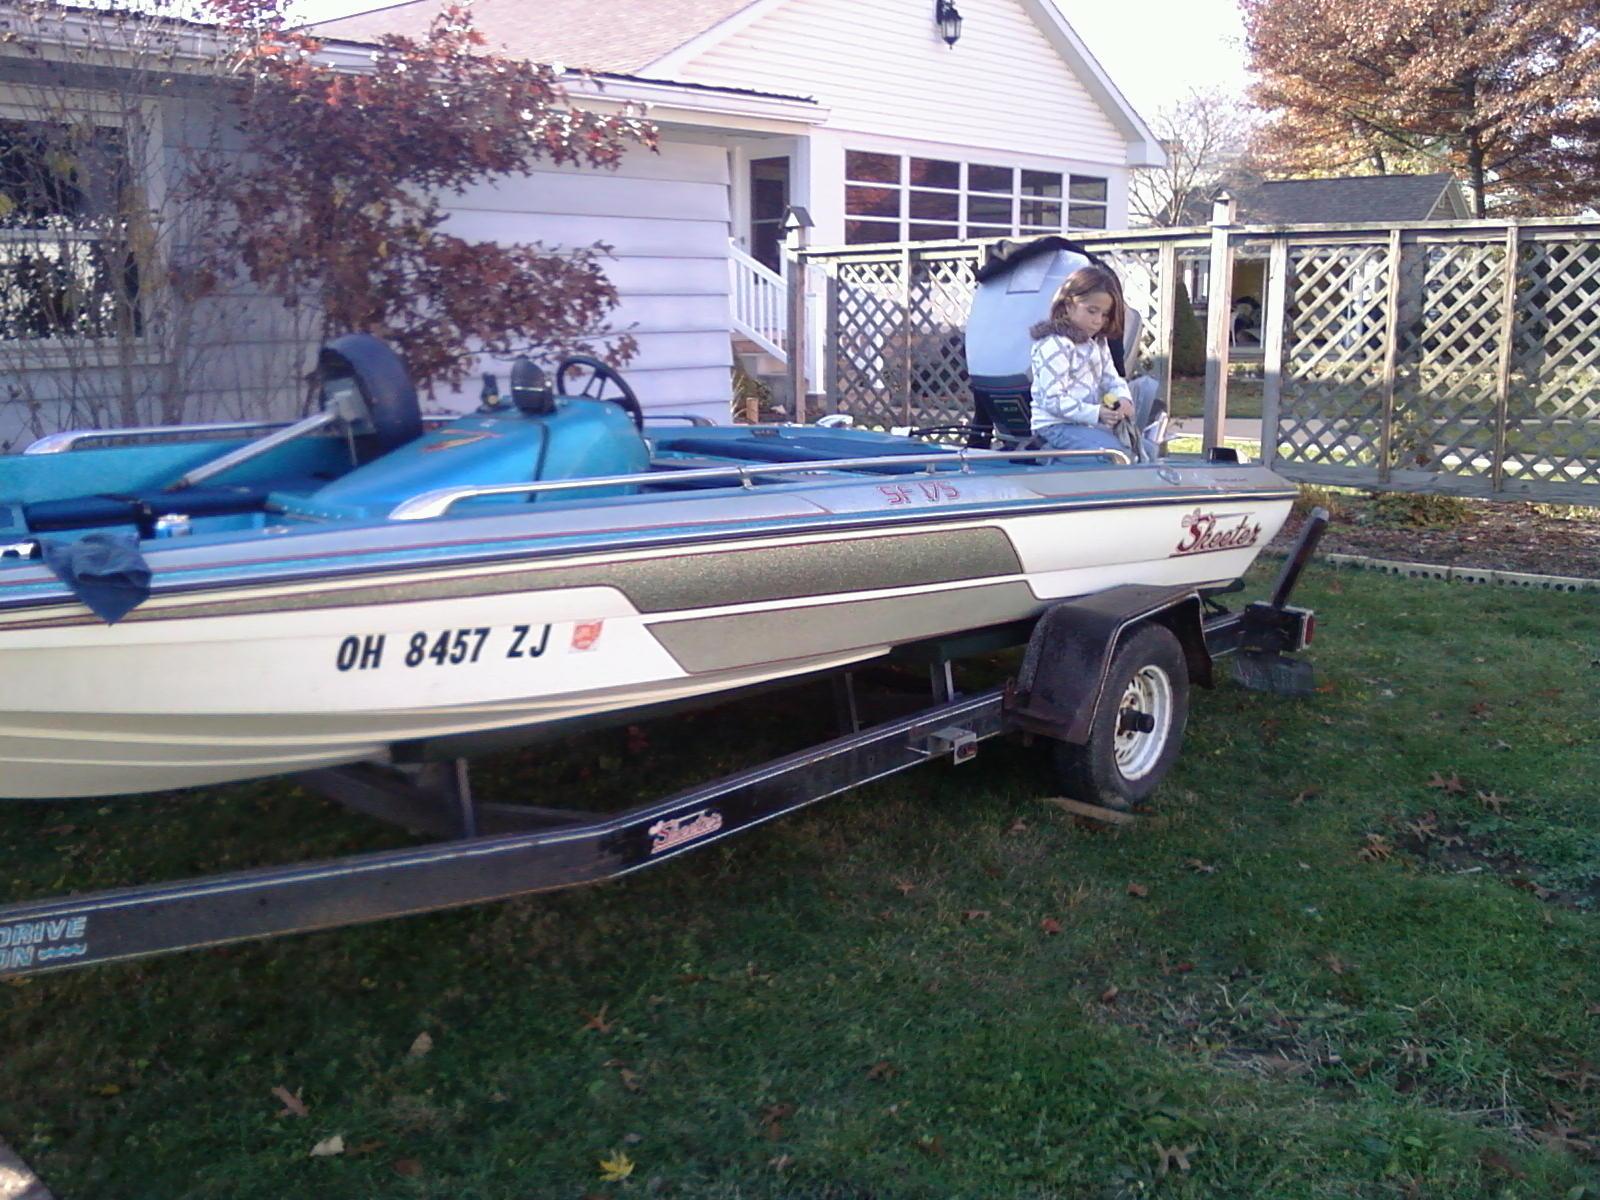 skeeter bass boat for sale - 600×450